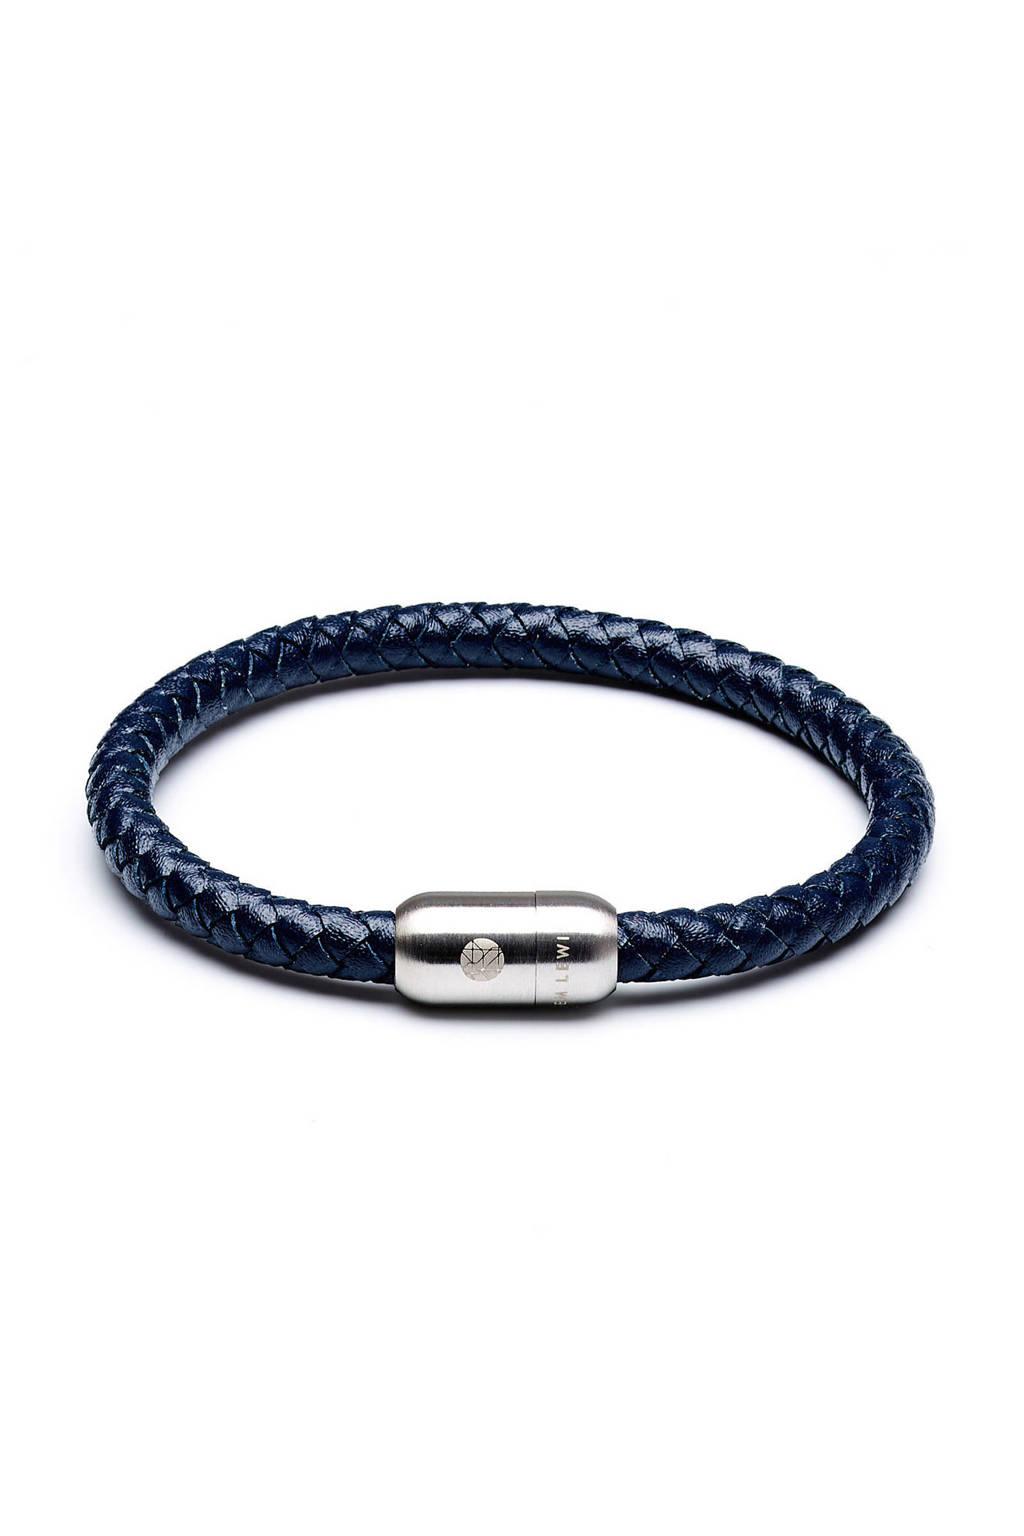 Sem Lewis Bakerloo Queen's Park armband SL210016, Blauw